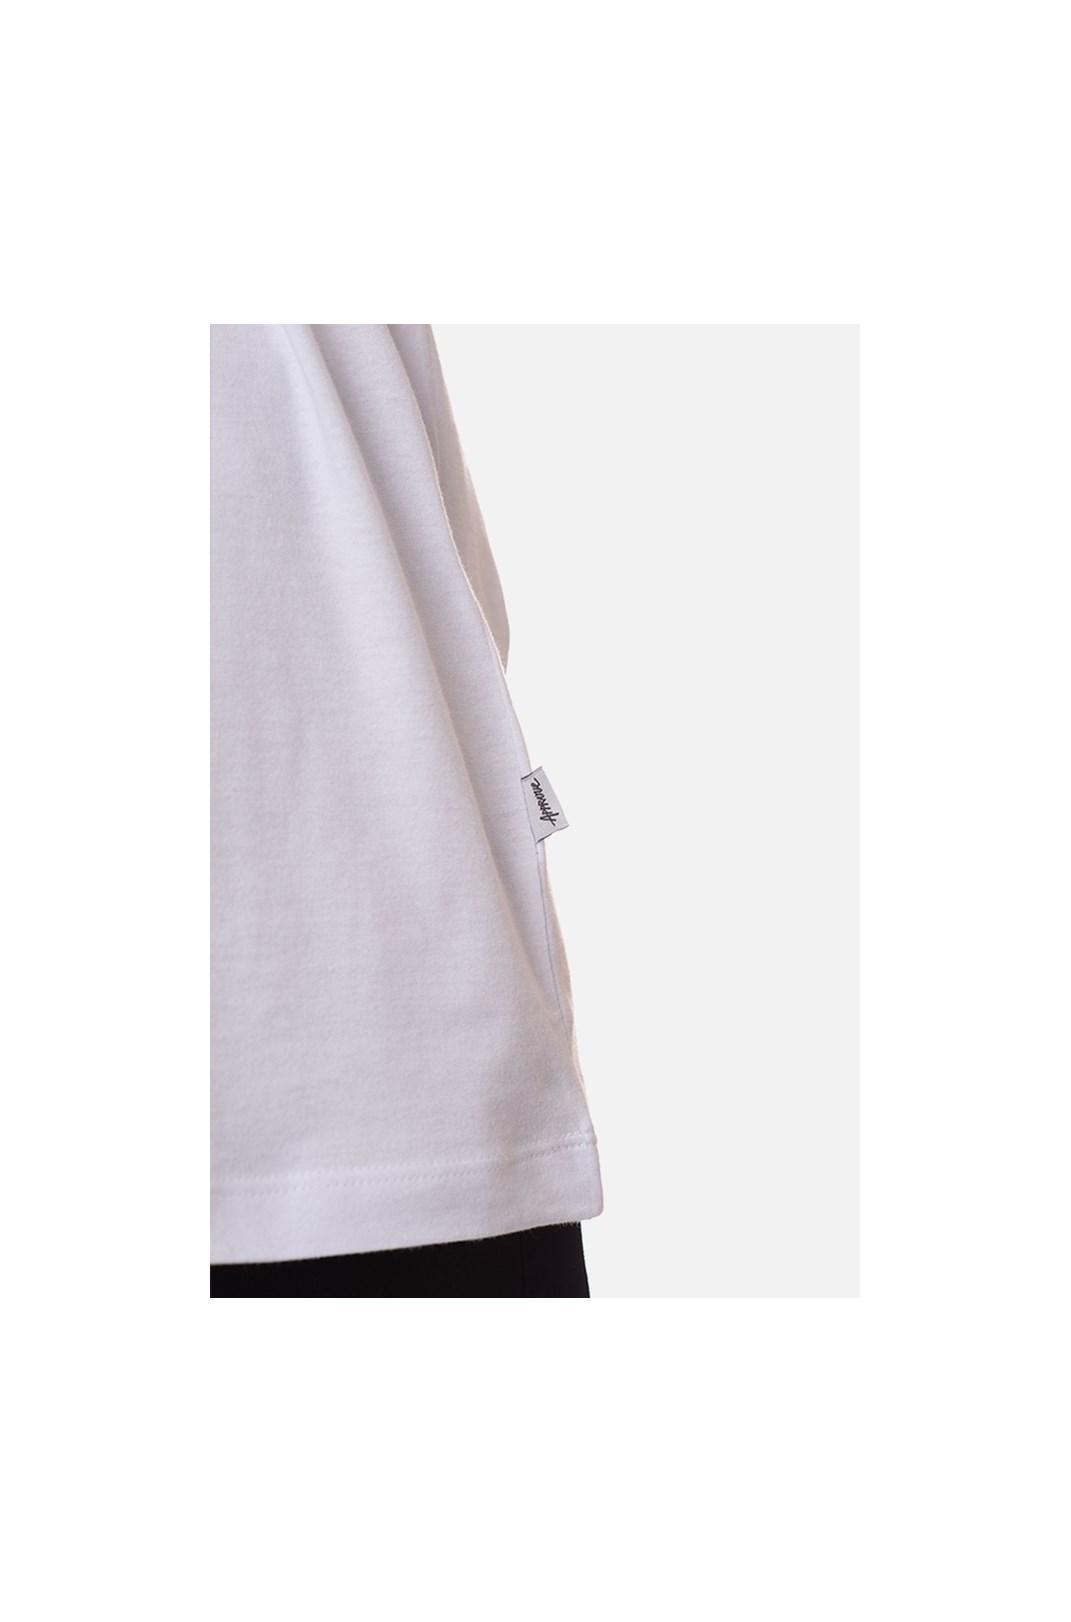 Camiseta Manga Longa Approve PB Branca